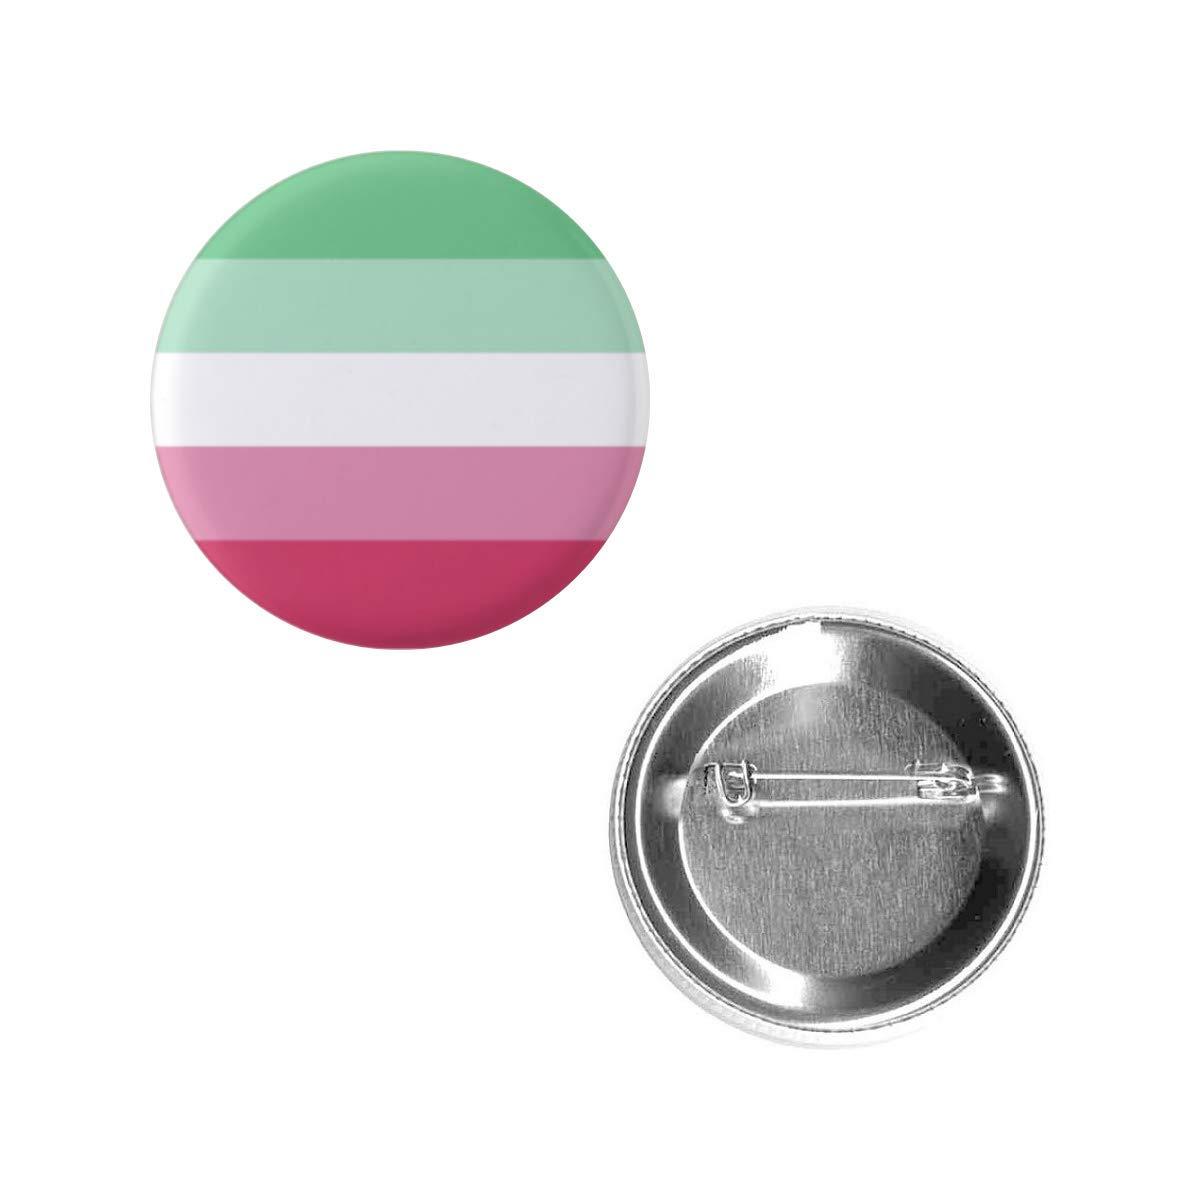 "Same day shipping Abrosexual Pride Flag Pin 1.5"" Round Shape P Button Metal Kansas City Mall Circle"